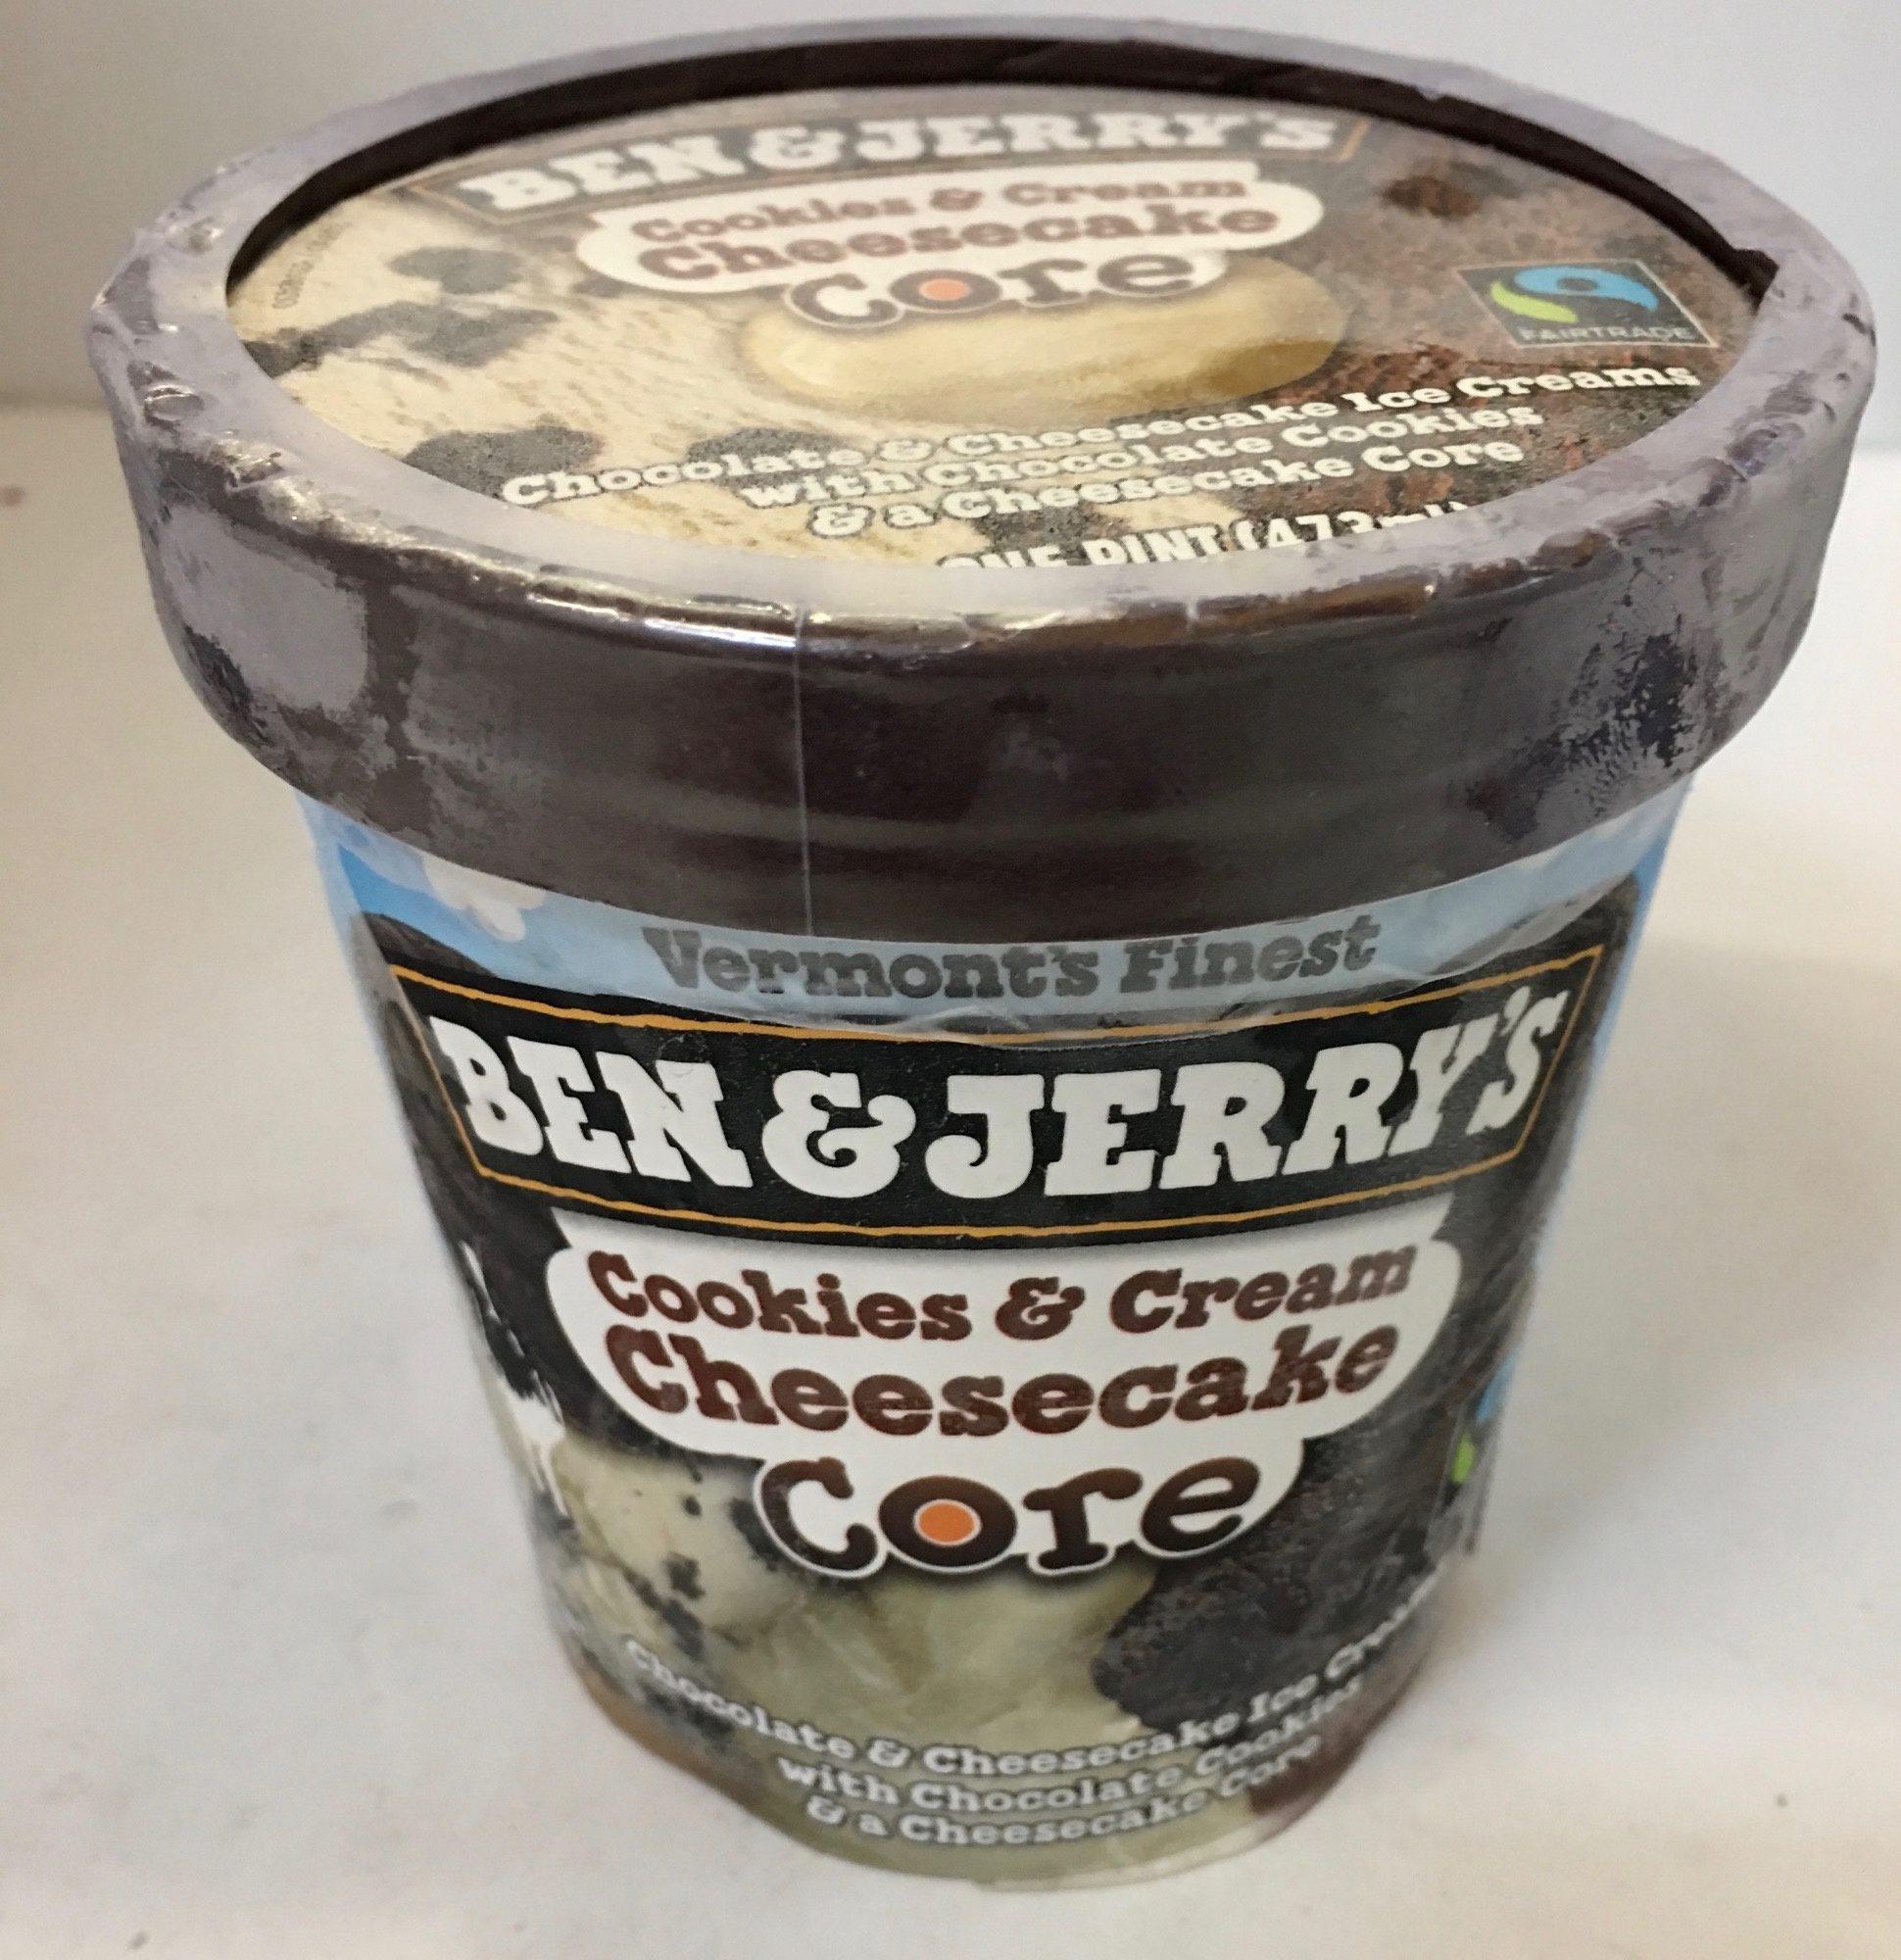 Core, Ice Cream, Cookies & Cream Cheesecake - Product